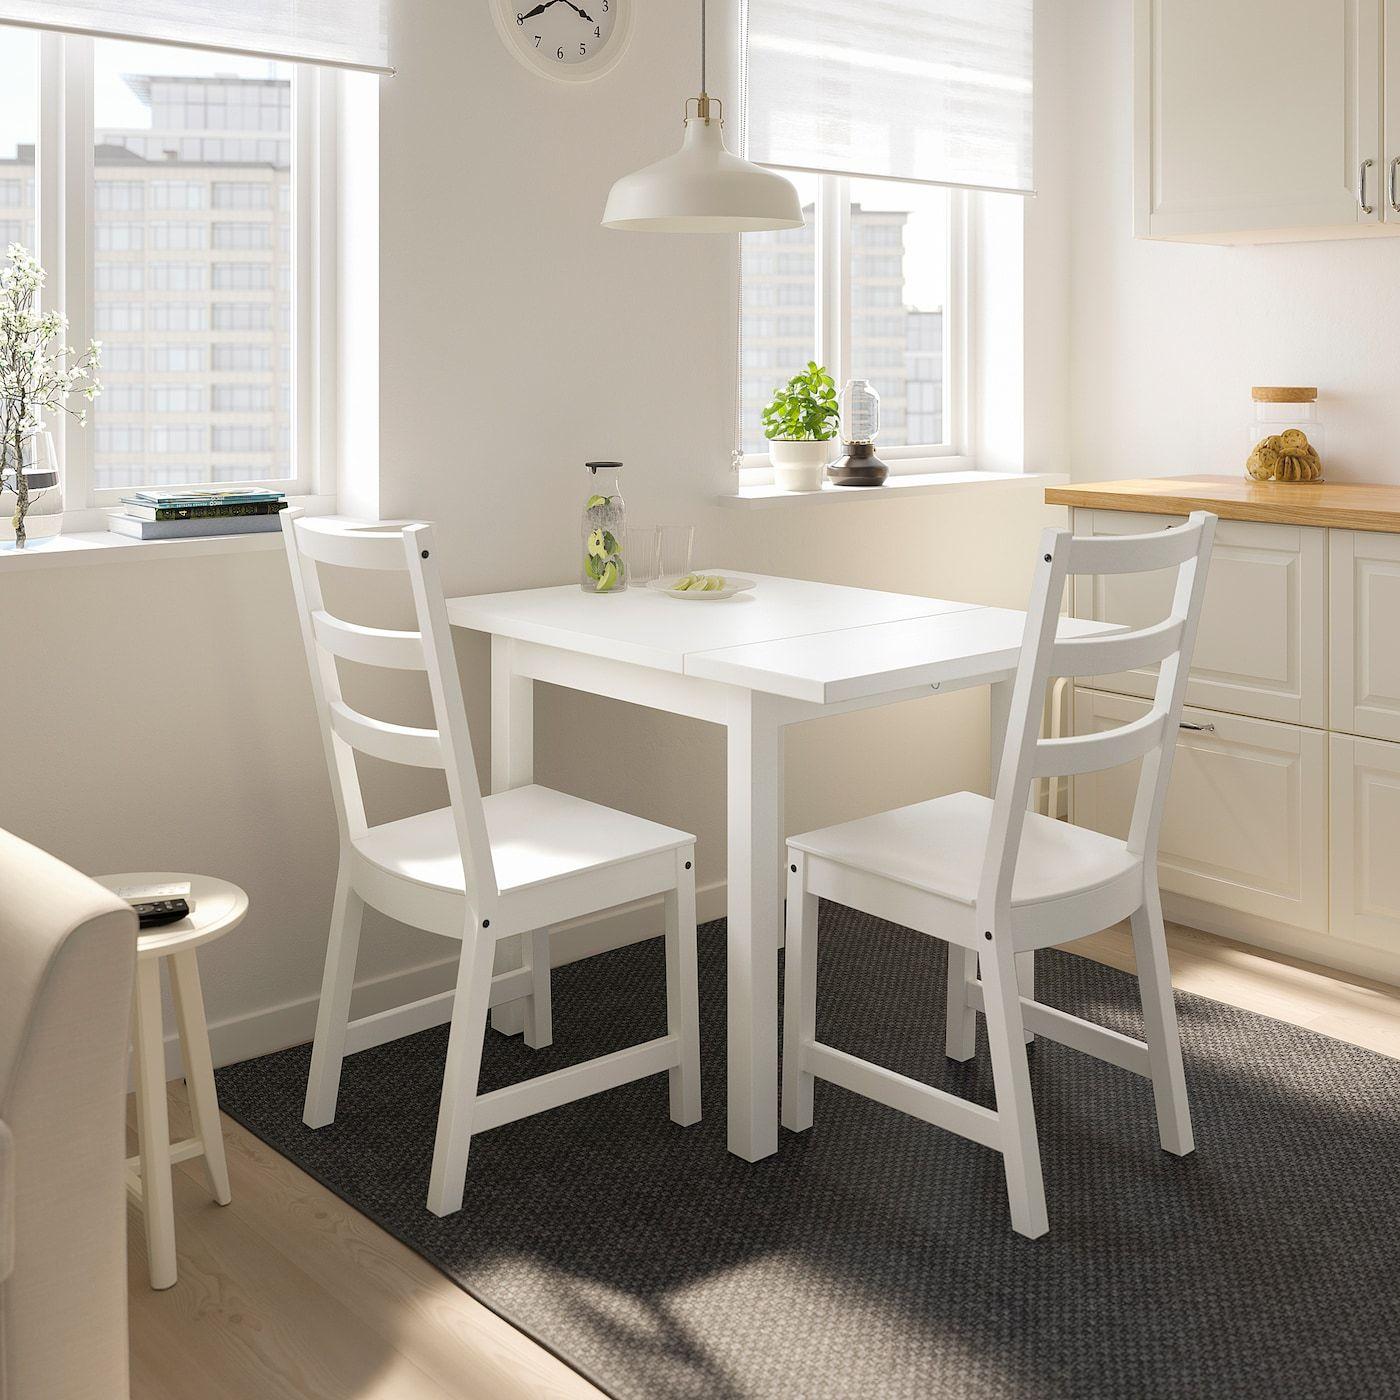 Fine Nordviken Nordviken Table And 2 Chairs White White In Cjindustries Chair Design For Home Cjindustriesco